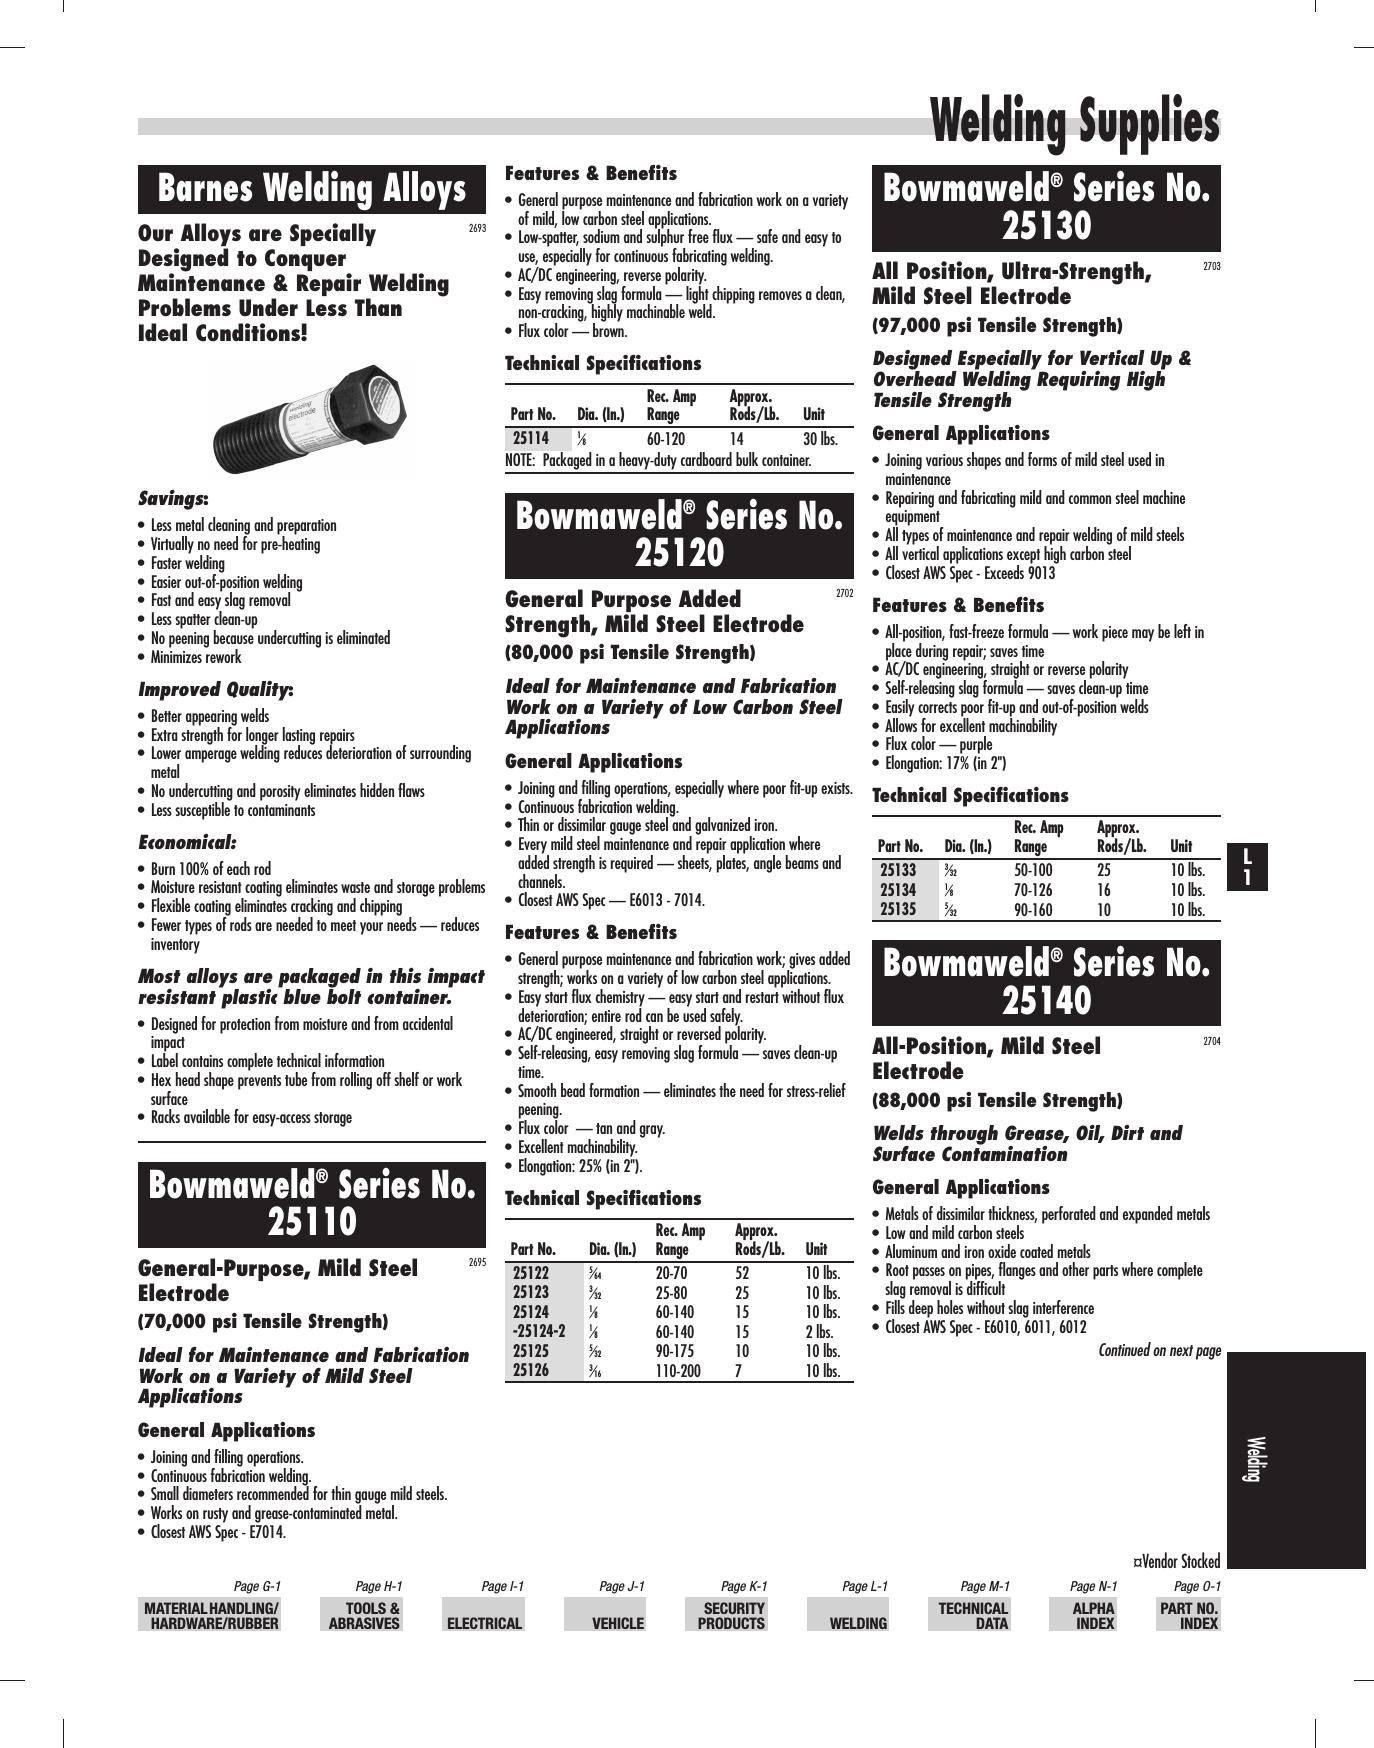 Nickel 99 Cast Iron Welding Electrode Repair /& Maintenance Rods 1//8-2 LBS